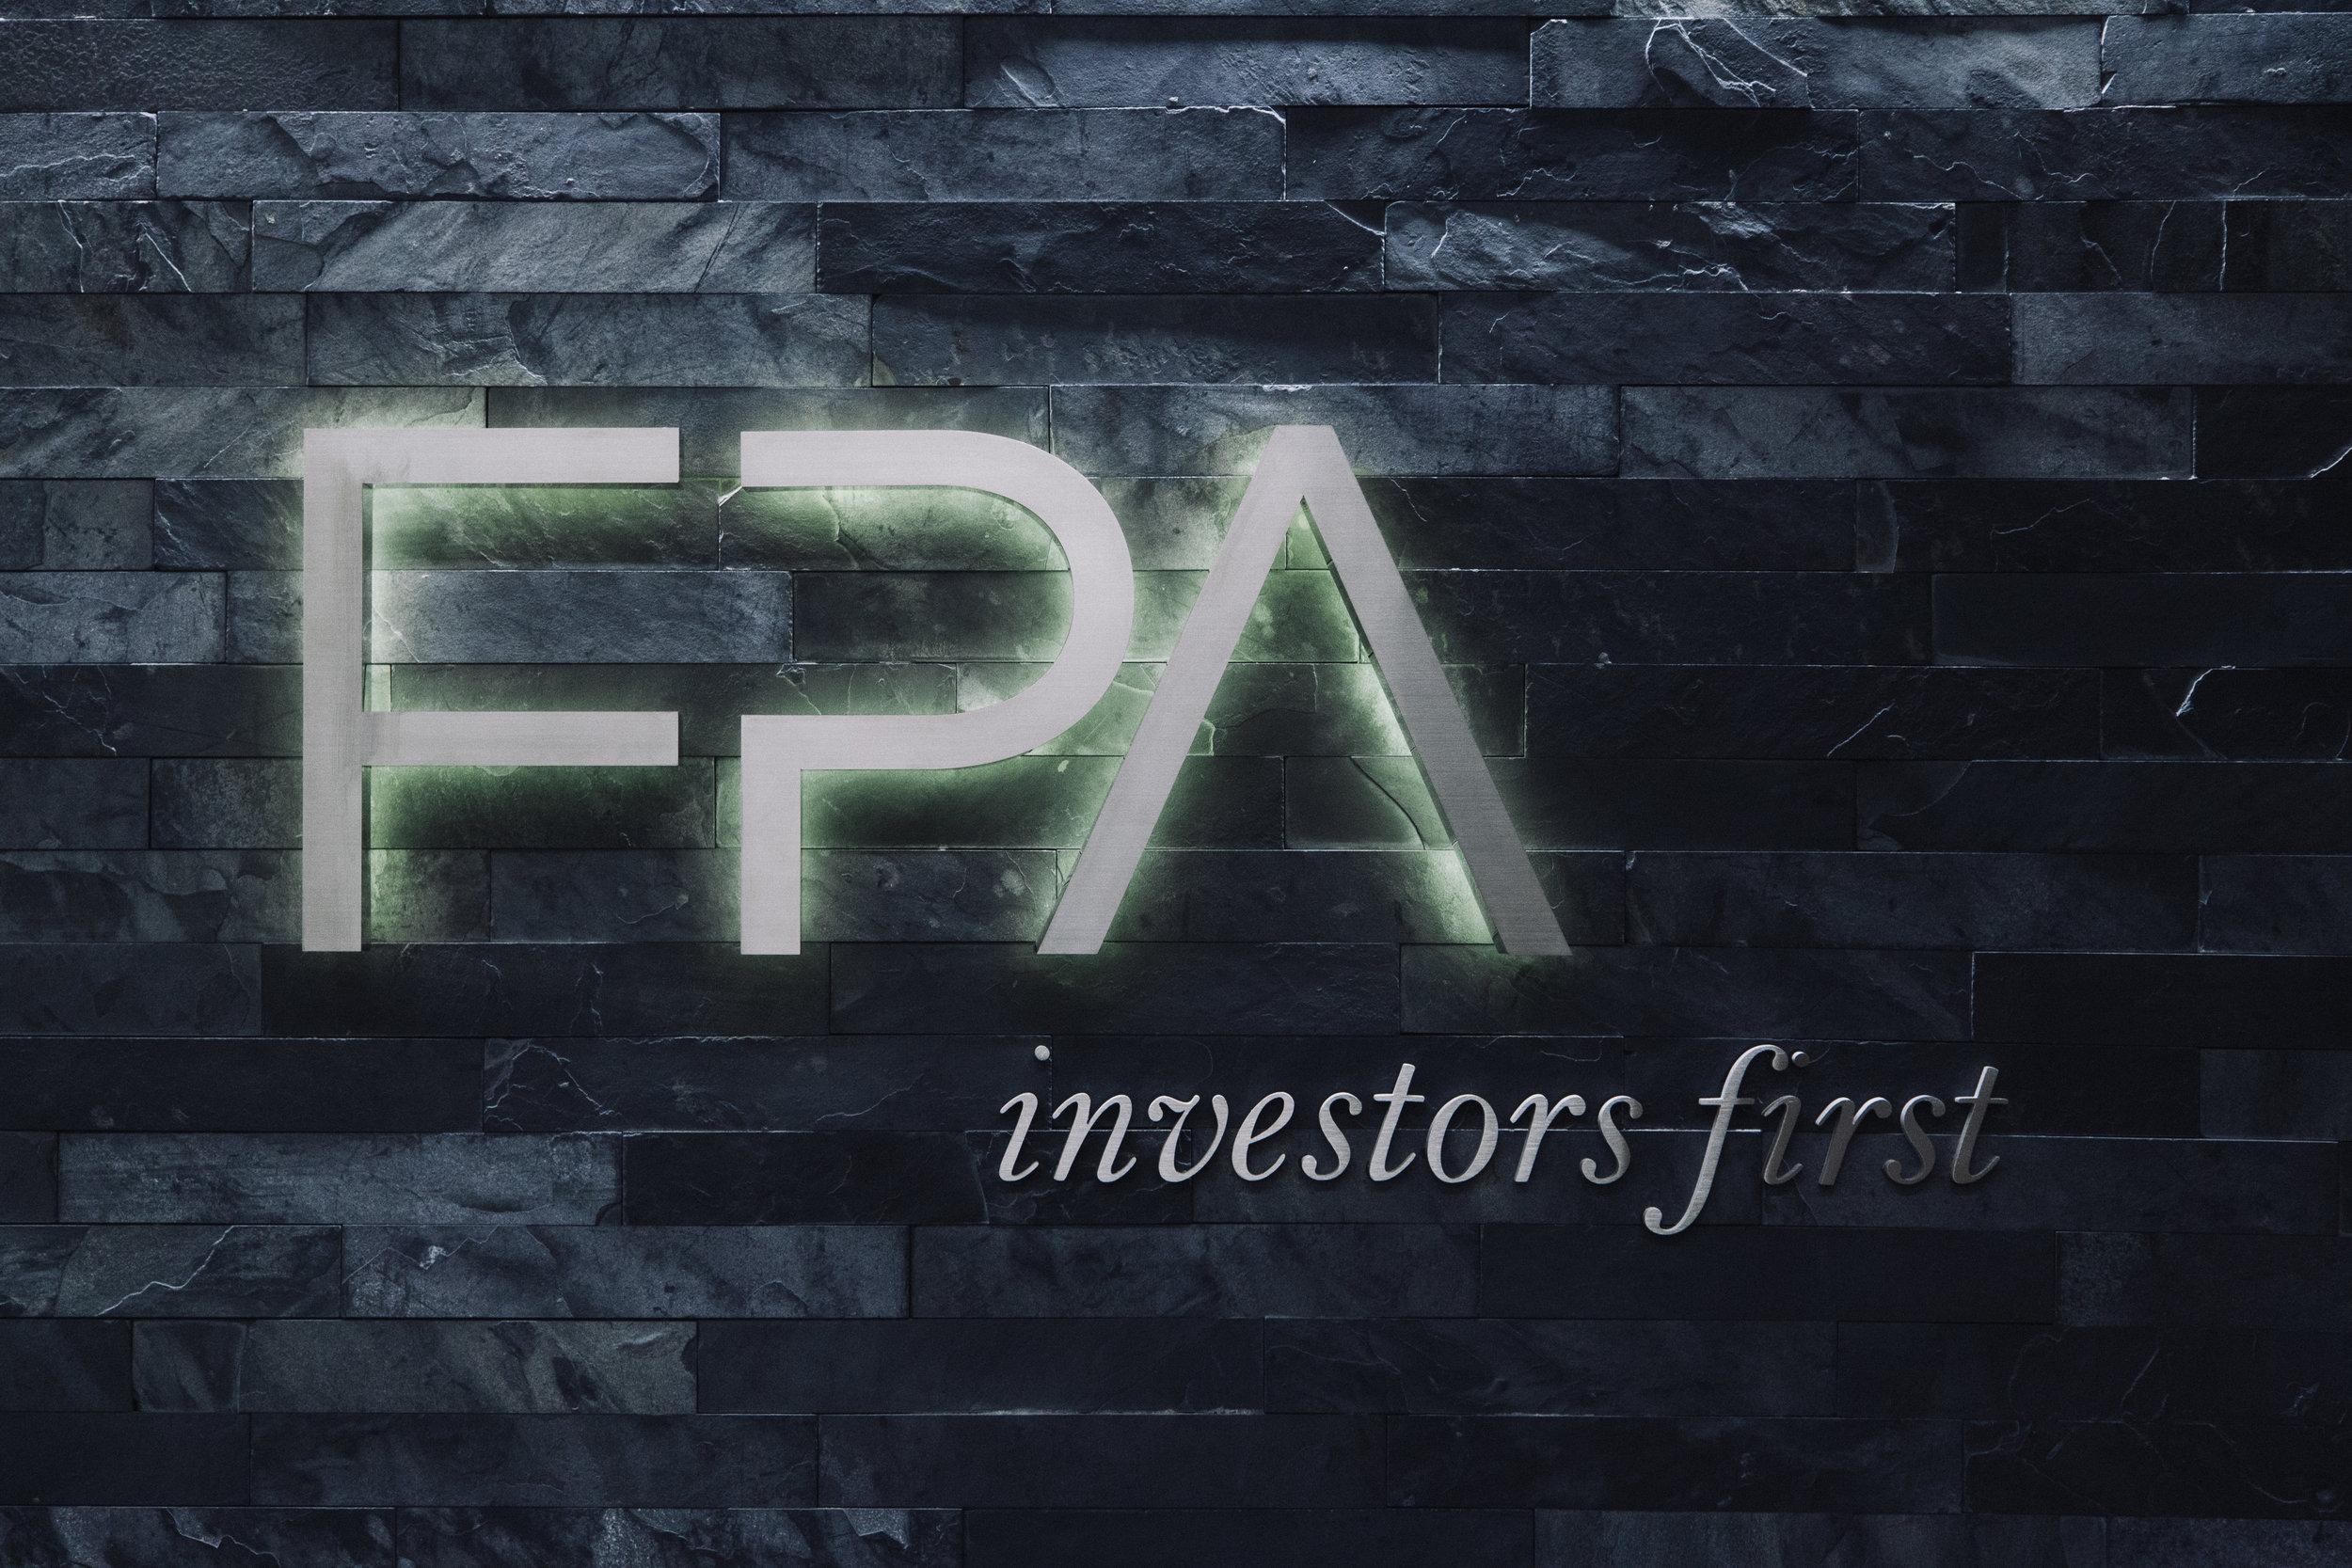 S.E.A.-Studio-Environmental-Architecture-David-Hertz-FAIA-First-Pacific-Advisors-Los-Angeles-tenant-improvement-sustainable-regenerative-restorative-green-design-office-sleek-modern-interior-Westside-commercial-building-professional-workplace-15.jpg